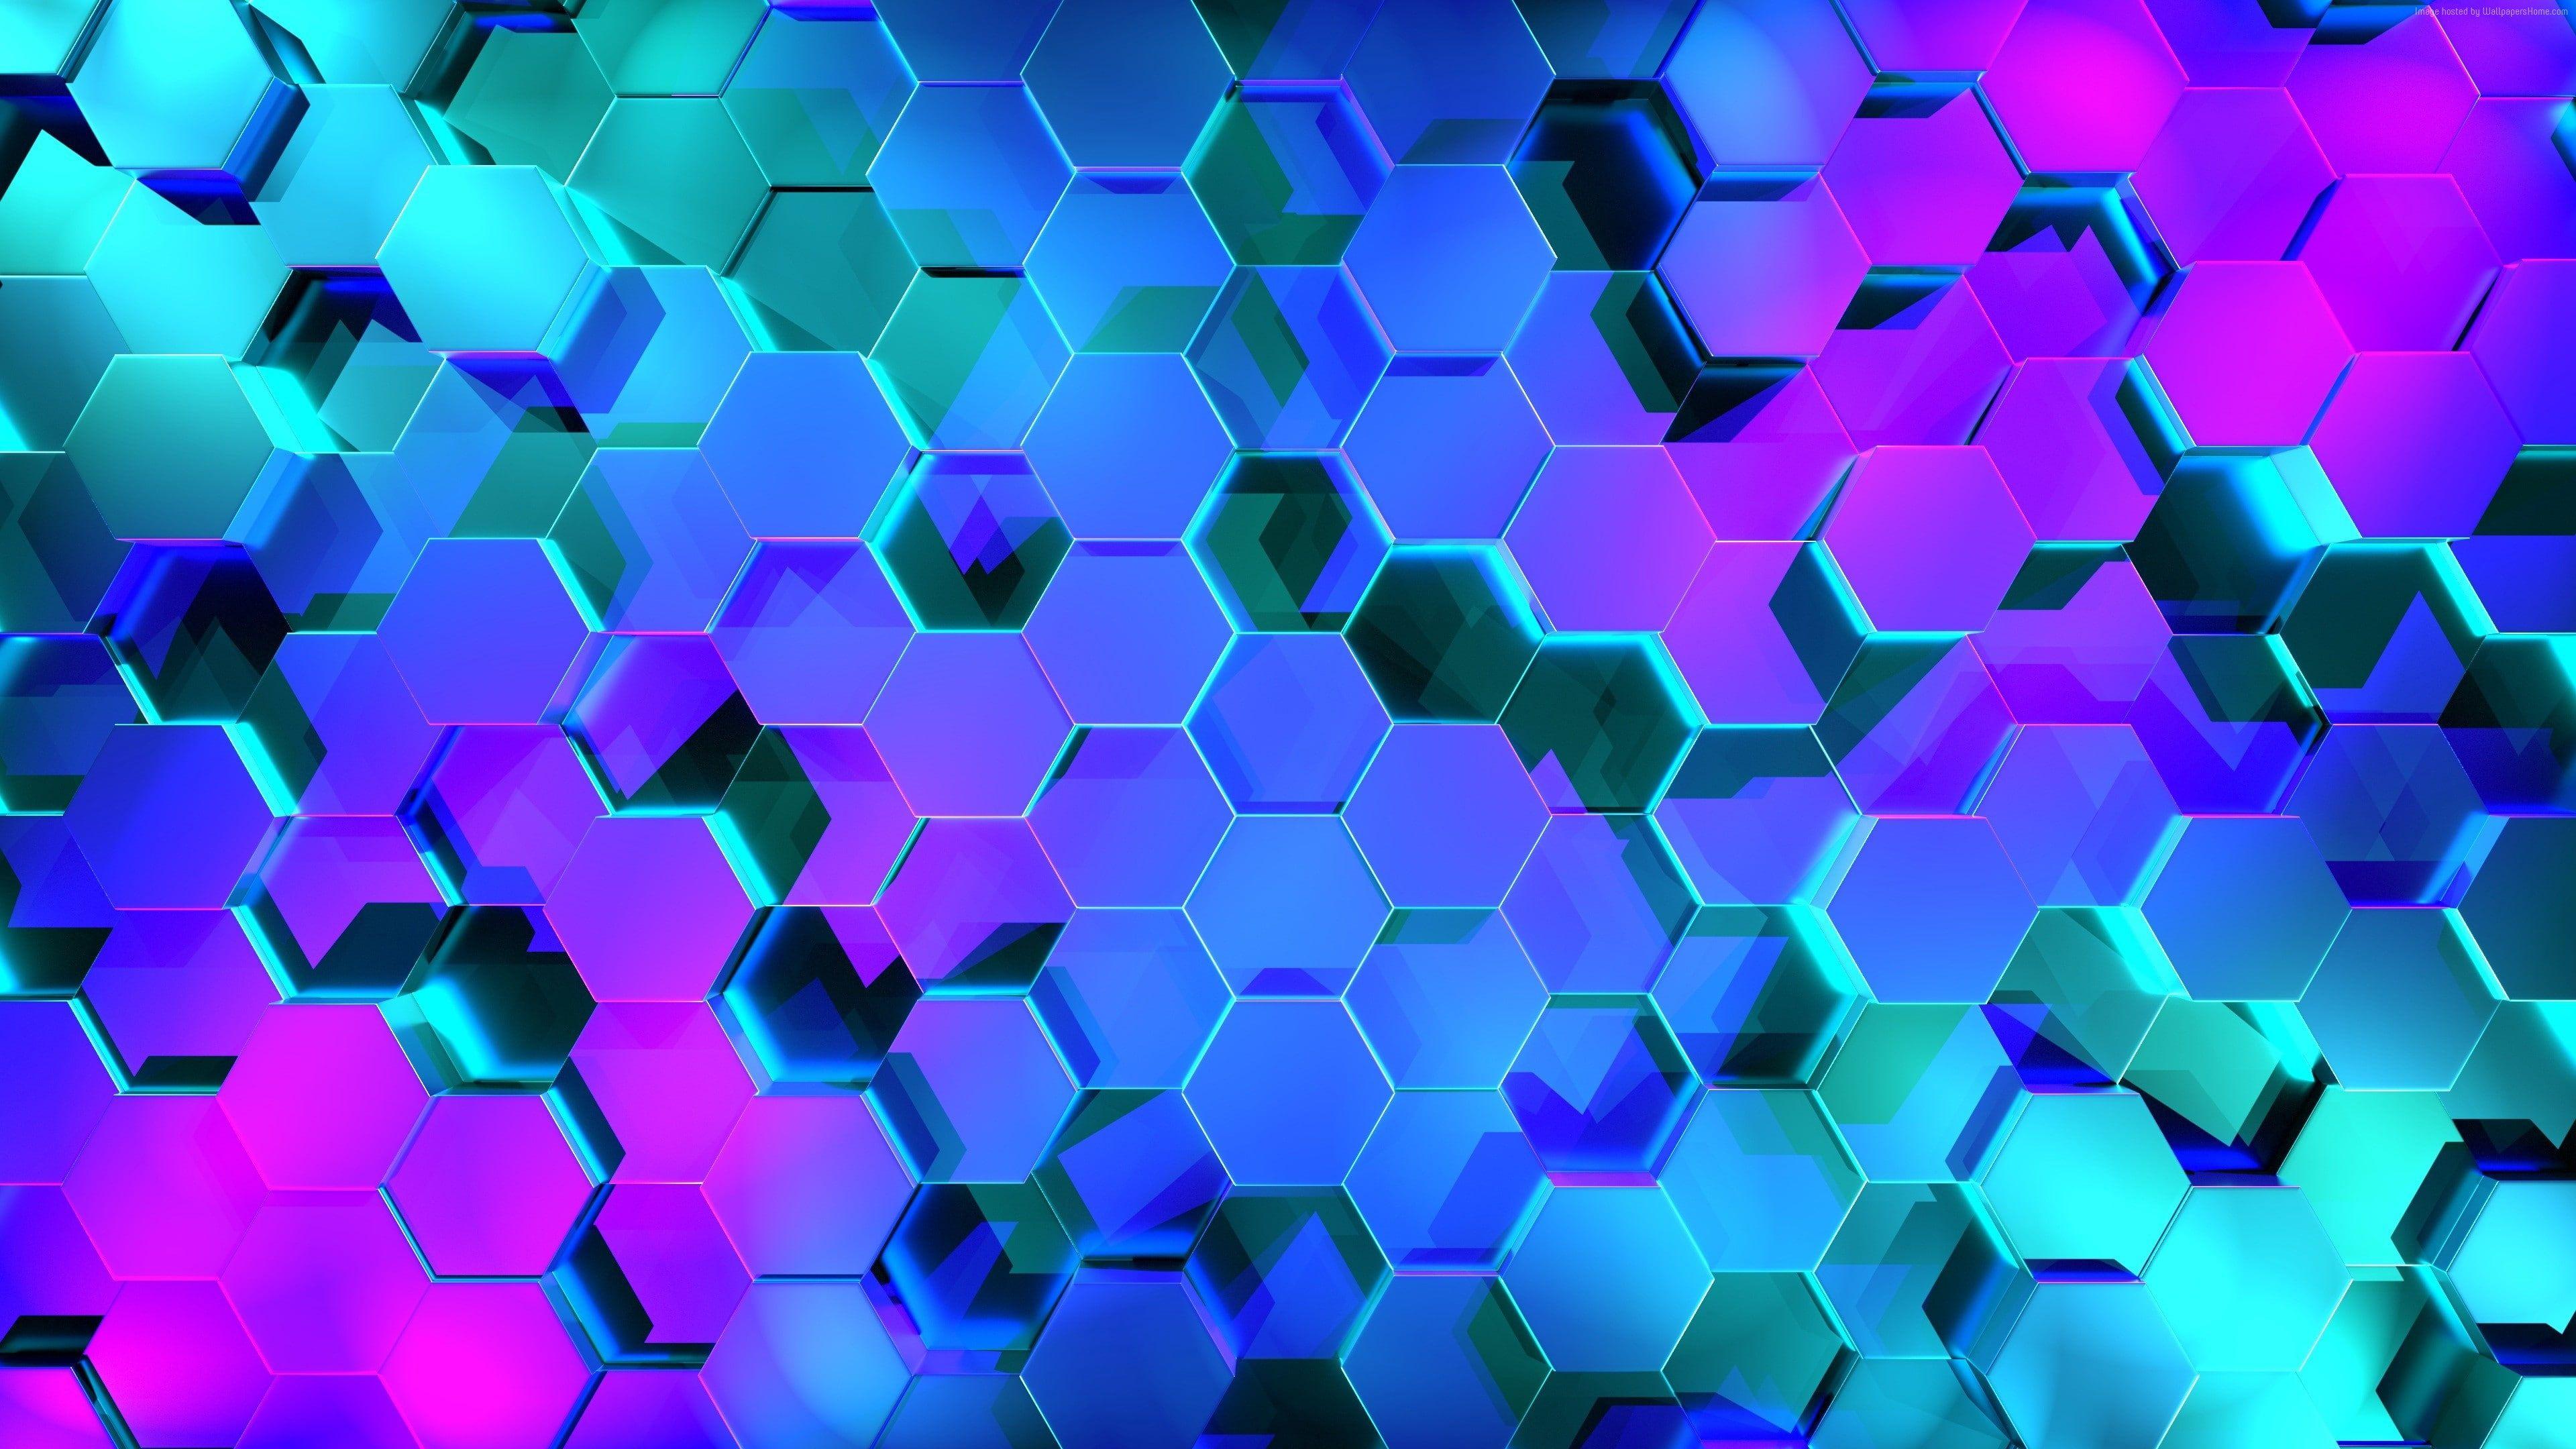 Hexagon 3d 4k Geometry Colors 4k Wallpaper Hdwallpaper Desktop Hexagon Wallpaper Neon Wallpaper Abstract Wallpaper